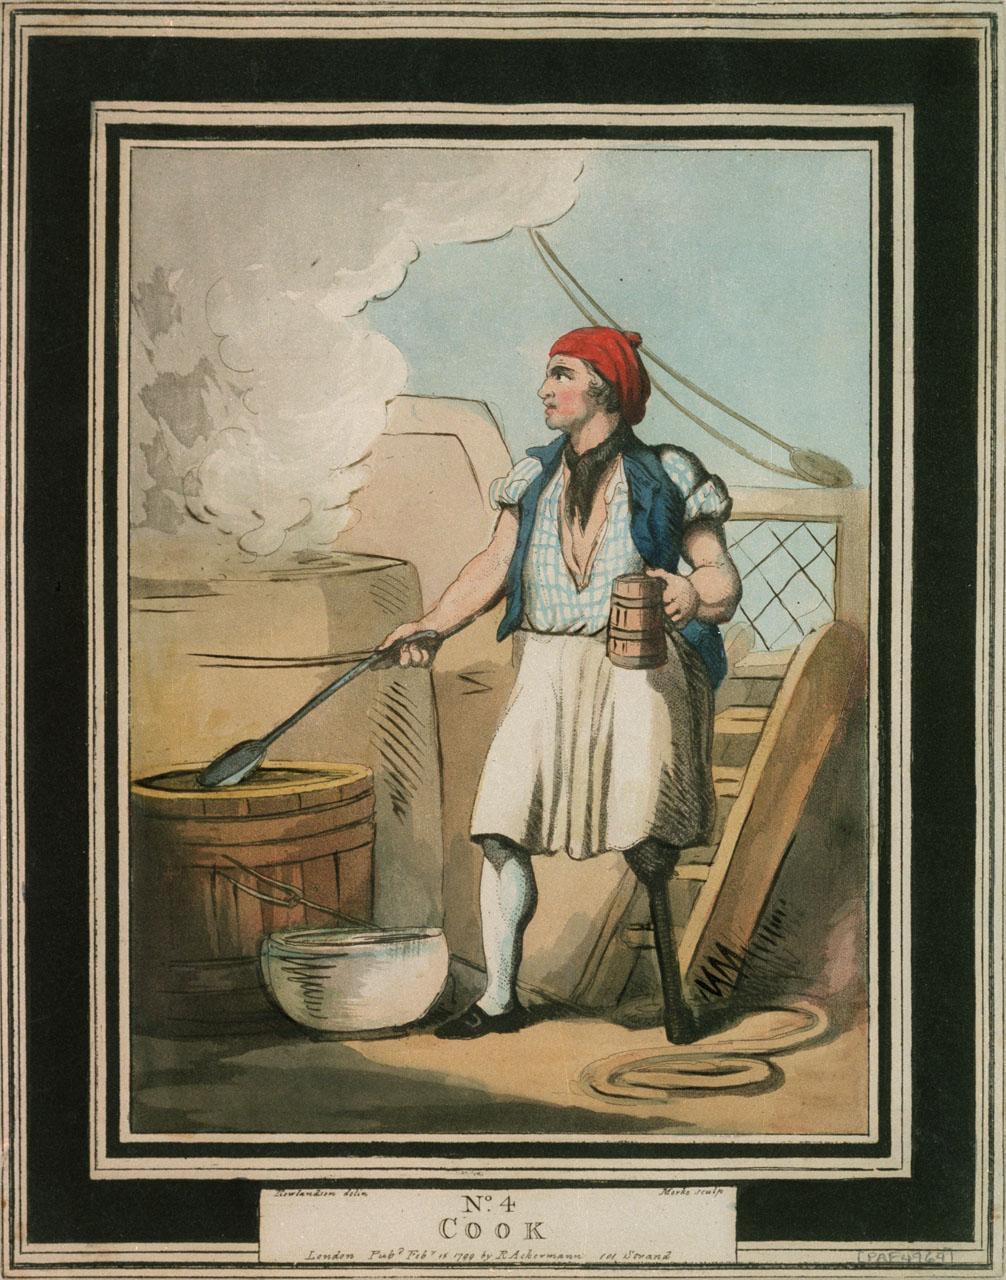 Cook Thomas Rowlandson 1799 NMM